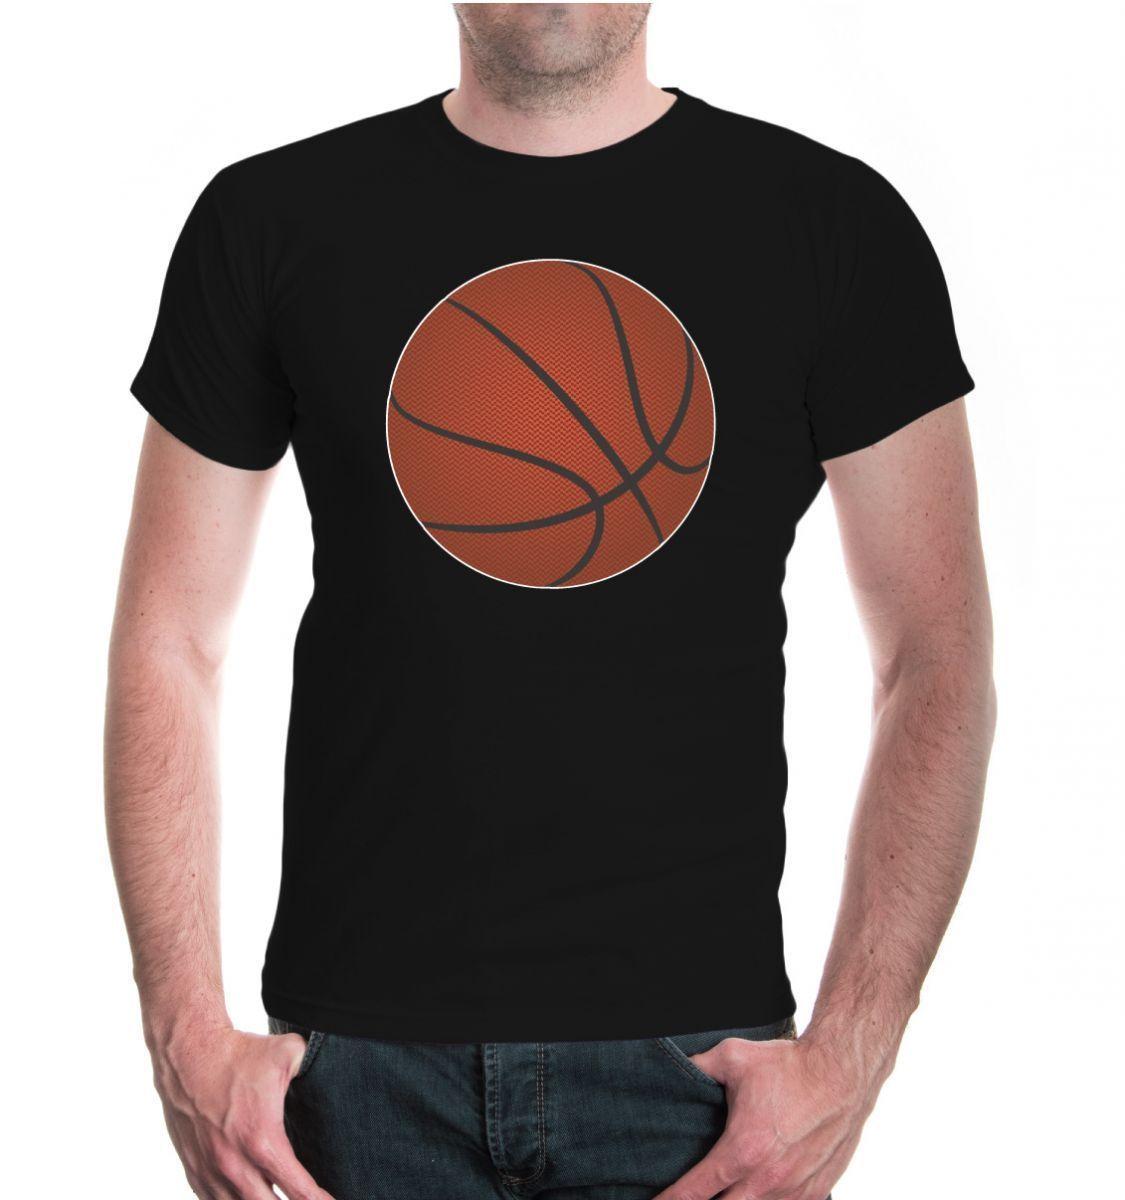 Herren Unisex Kurzarm Tişört Basketbol Topu V2 Fanshirt Ballsport Motiv